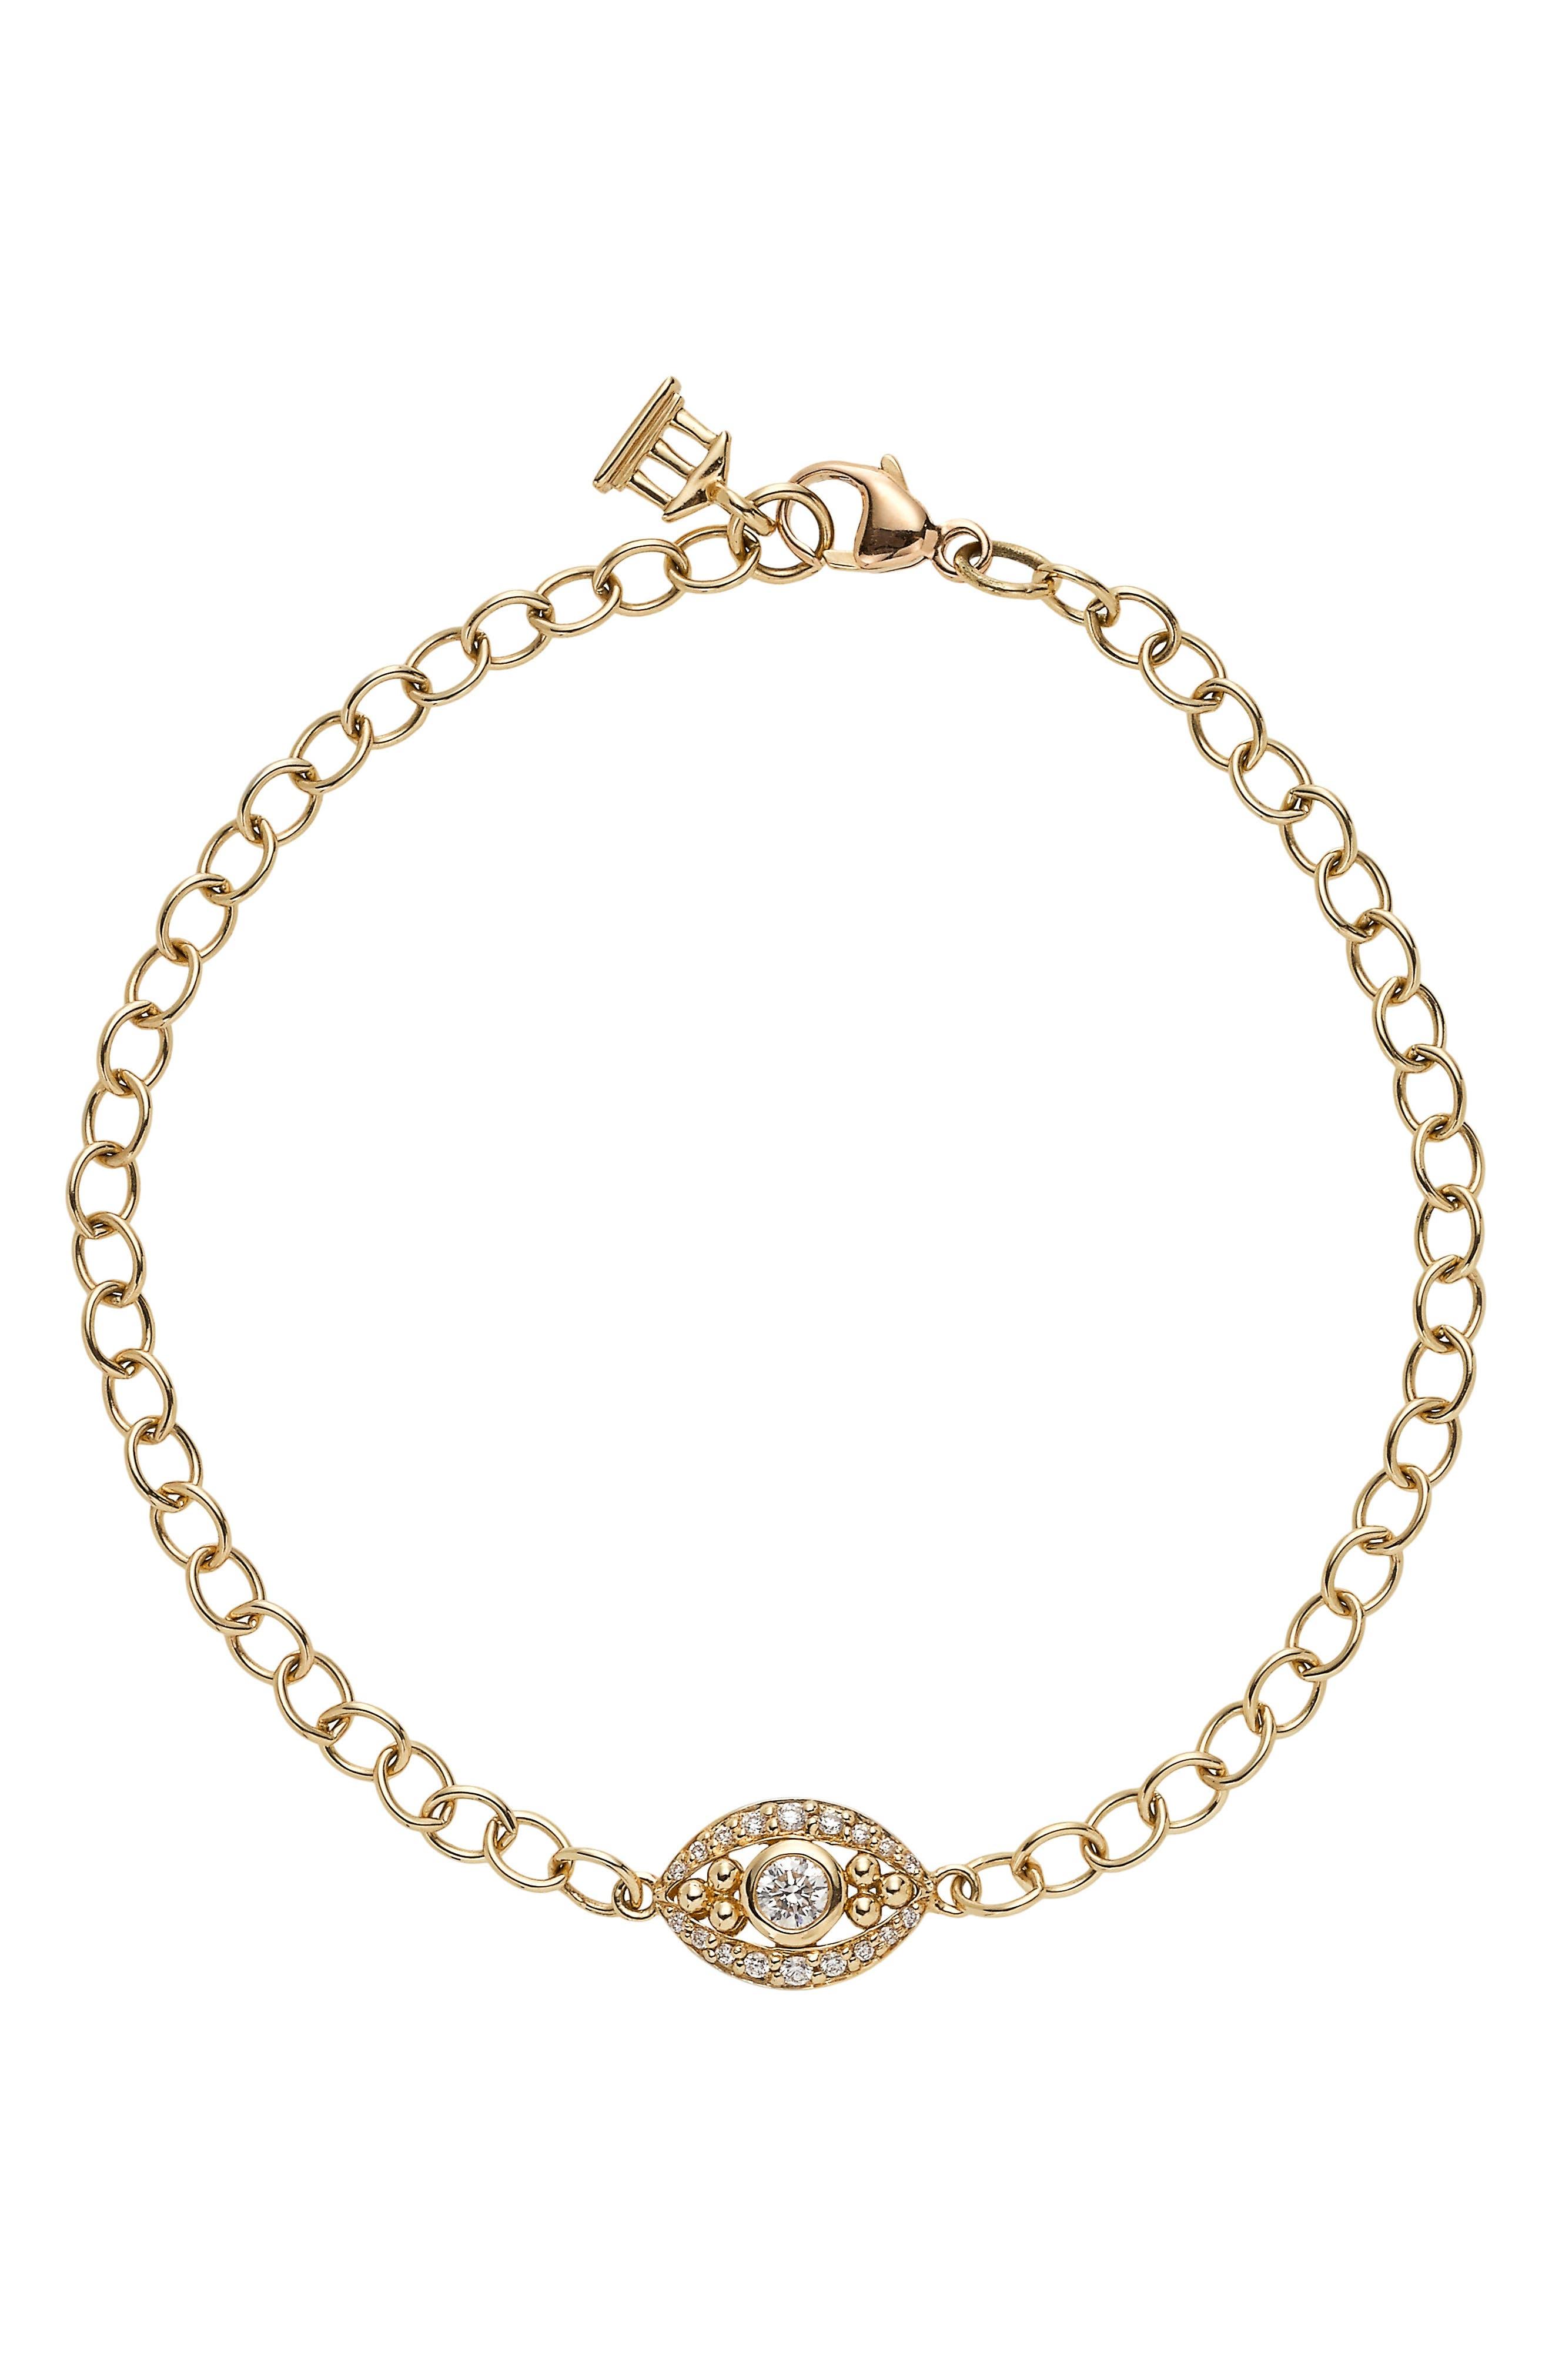 Alternate Image 1 Selected - Temple St. Clair Diamond Evil Eye Line Bracelet